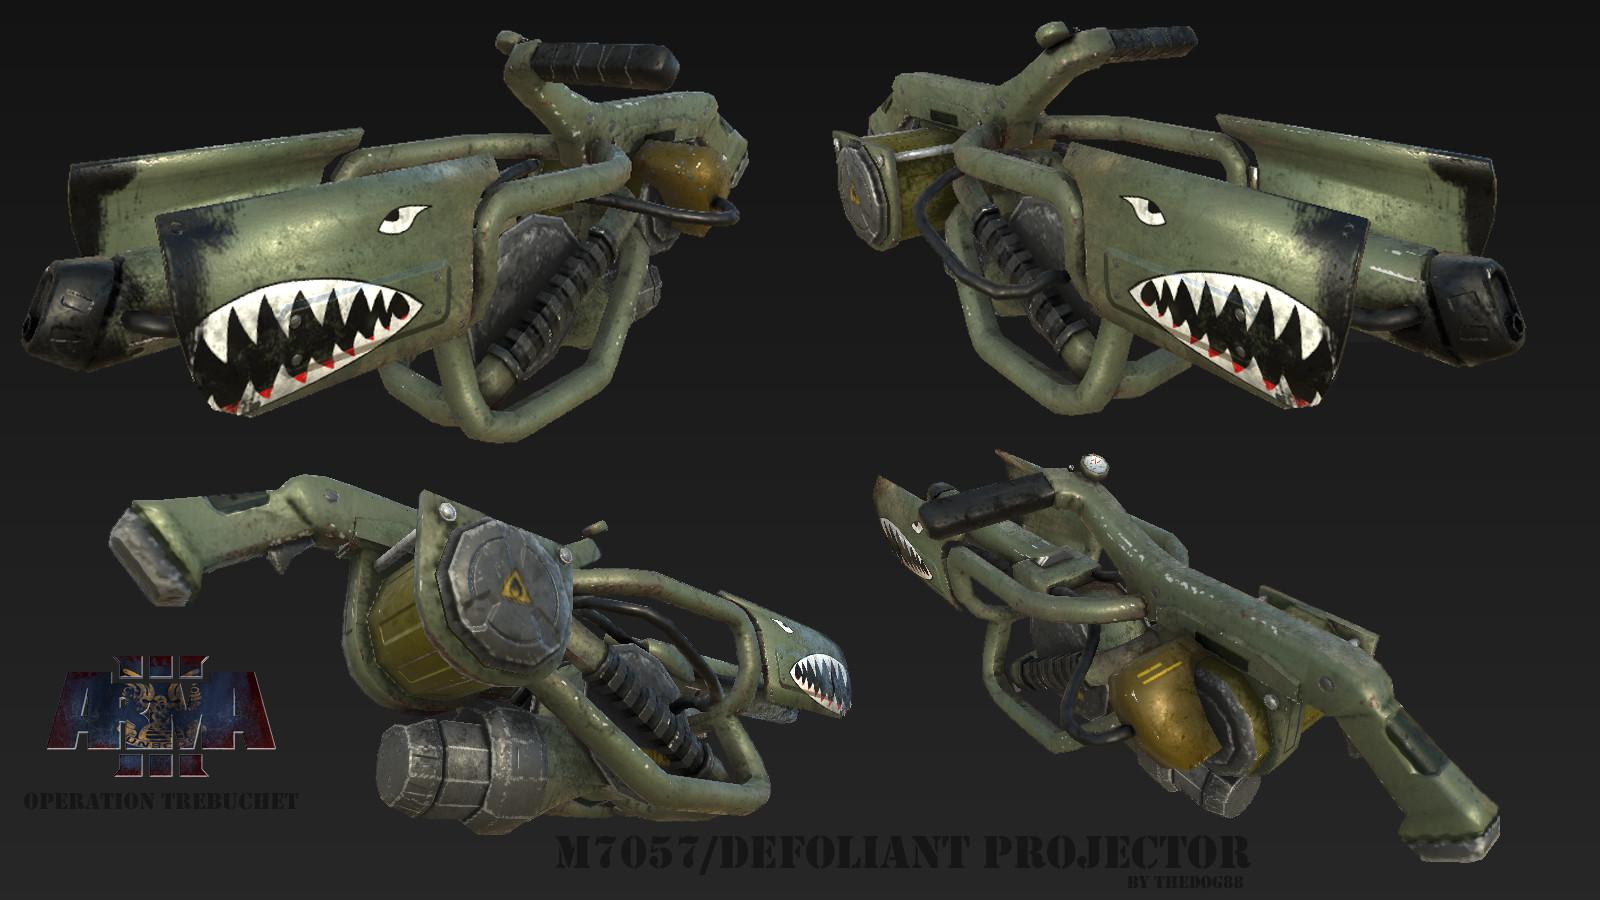 ArtStation - Arma 3 Mod Operation Trebuchet, Chris Mauro